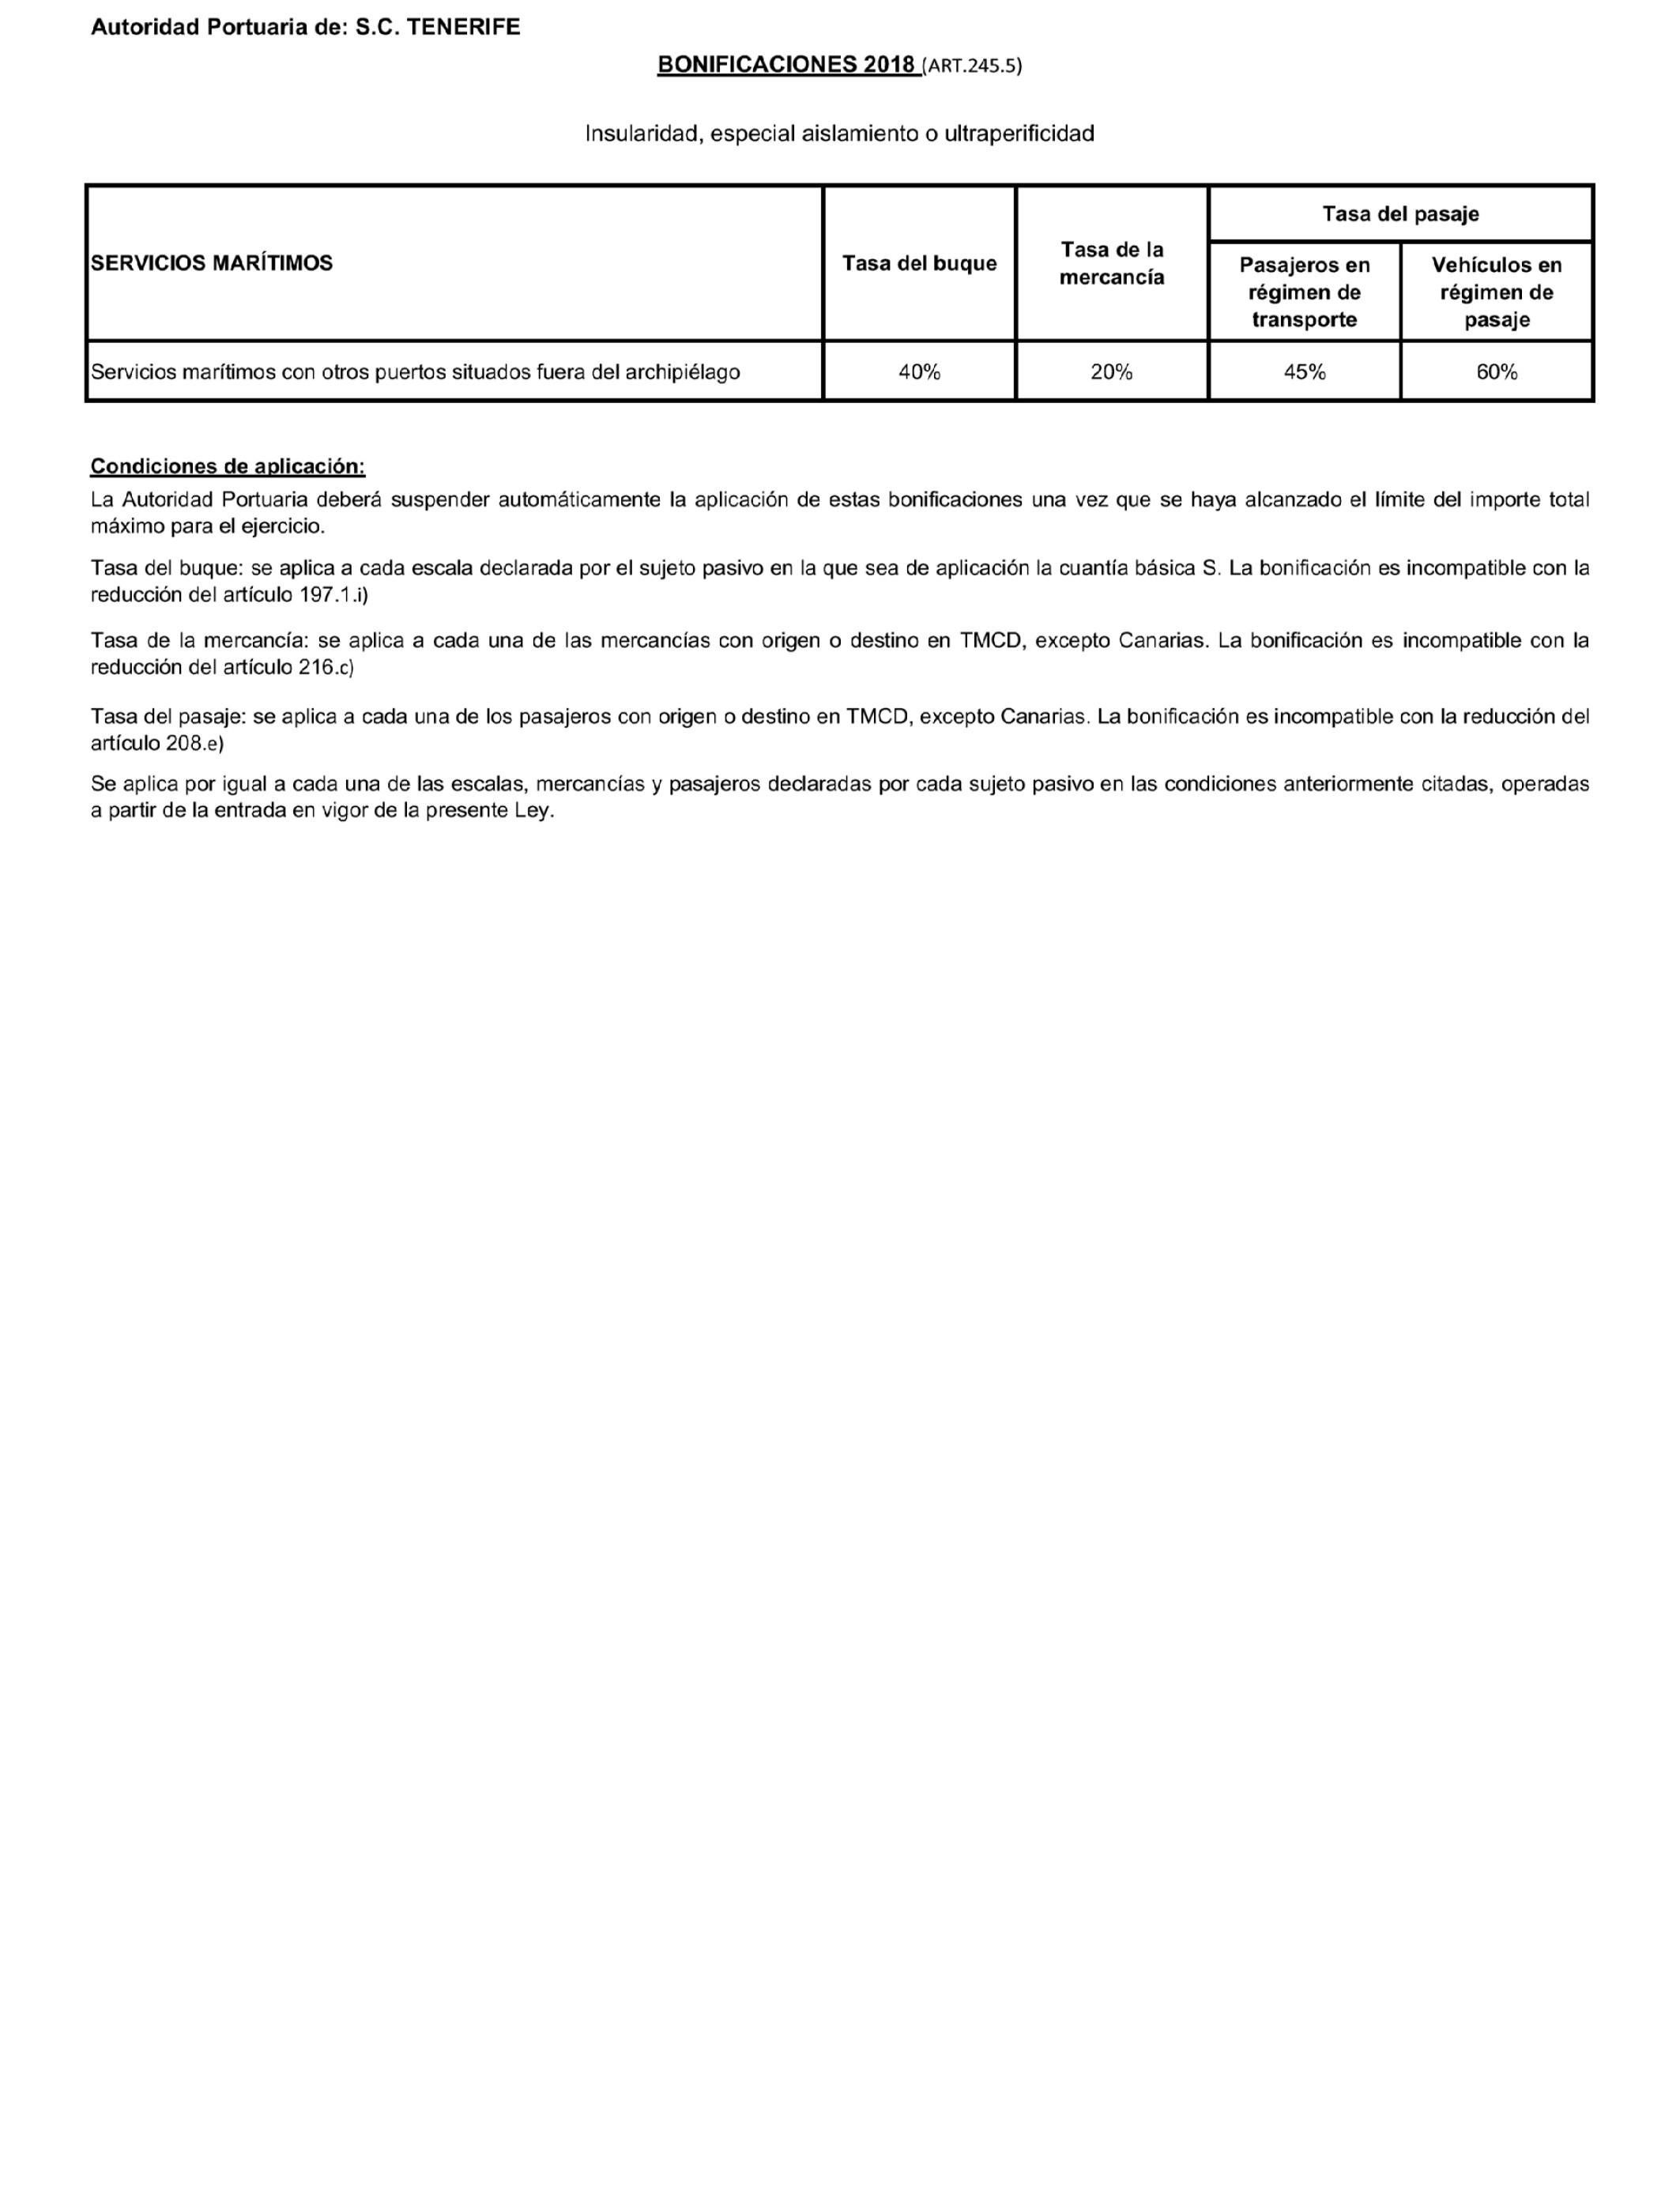 Calendario Enero 2019 Usa Con Dias Festivos En Más Recientes Boe Documento Consolidado Boe A 2018 9268